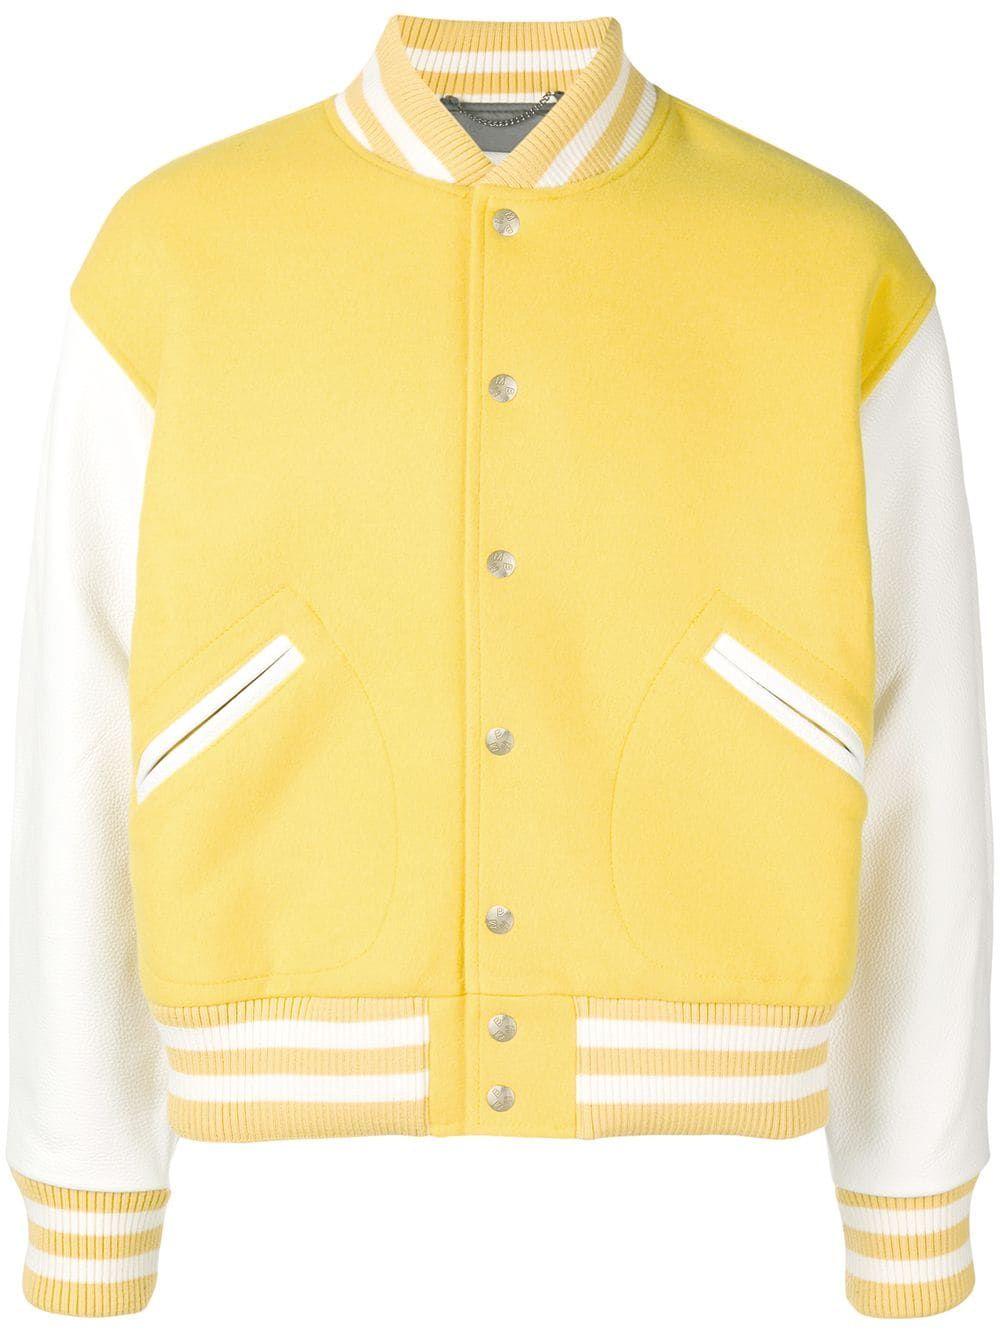 MISBHV Contrast Sleeve Varsity Jacket - Farfetch